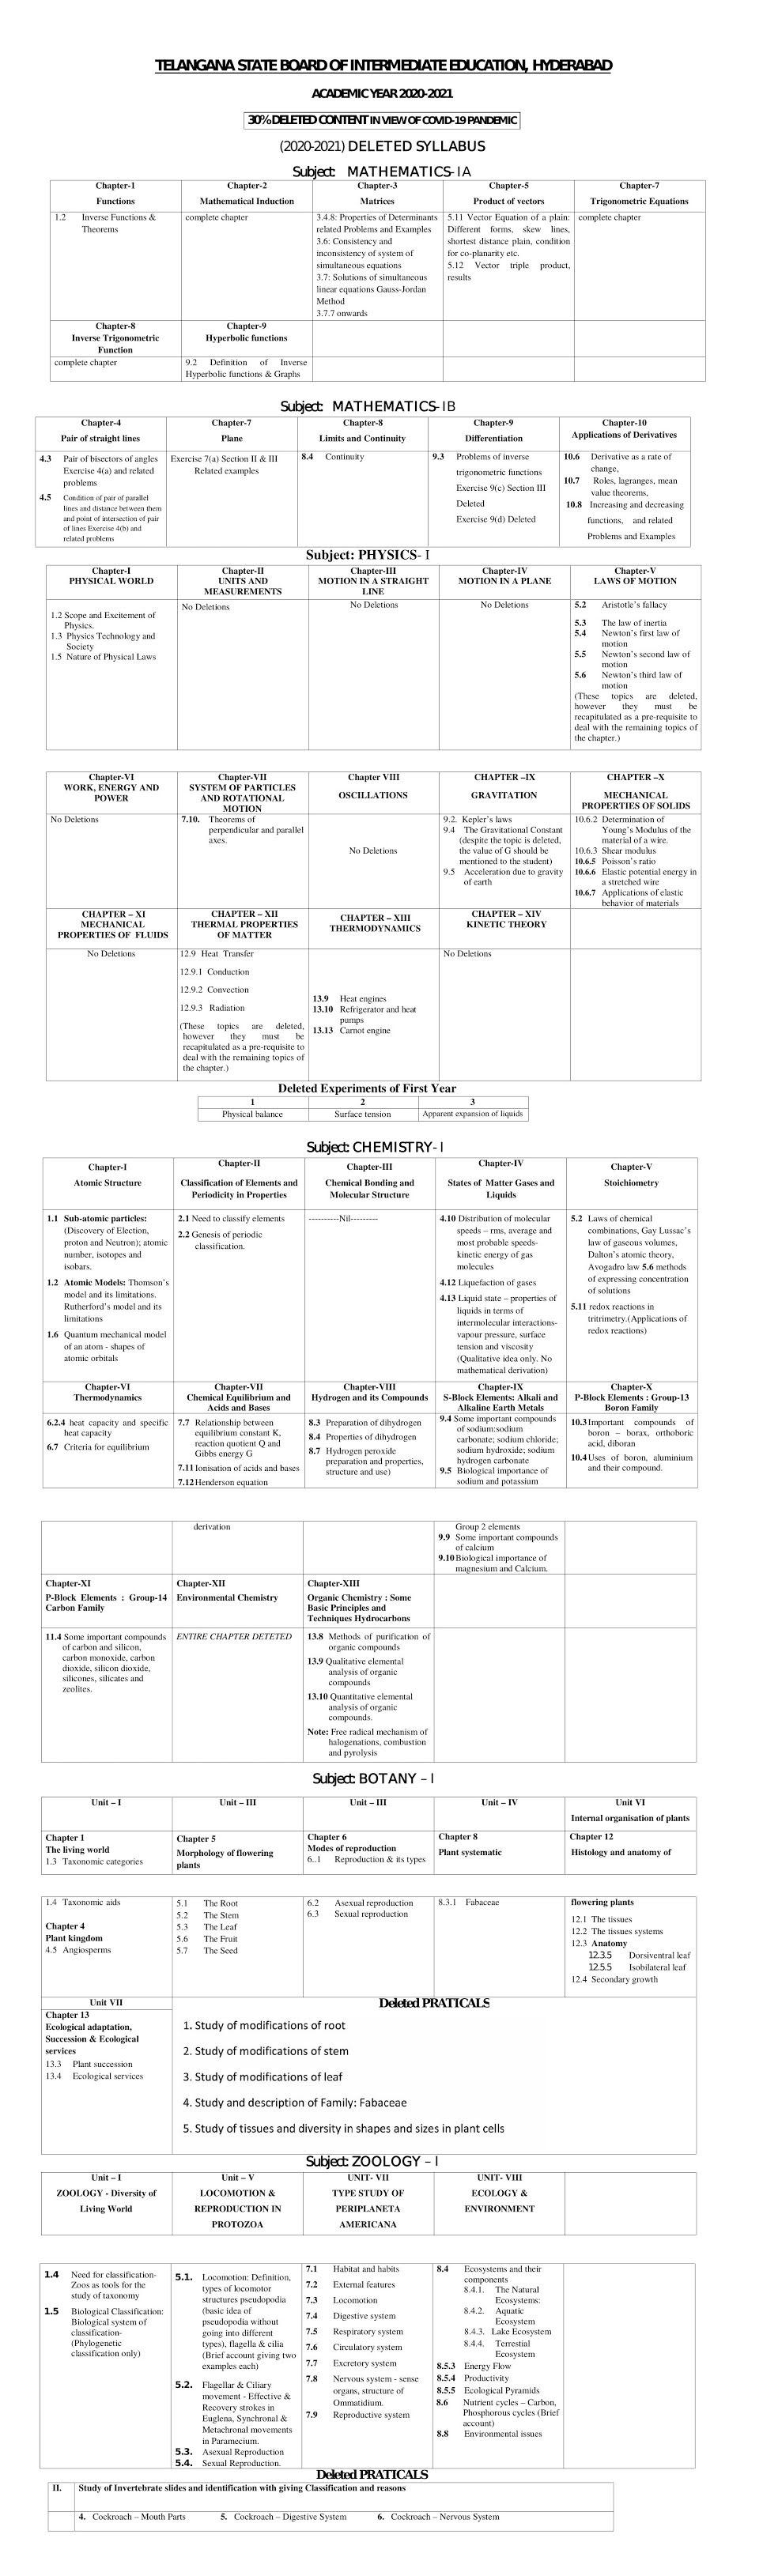 AP Go-Nuumber.143 Reimbursement of Medical Expenses For Higher Education